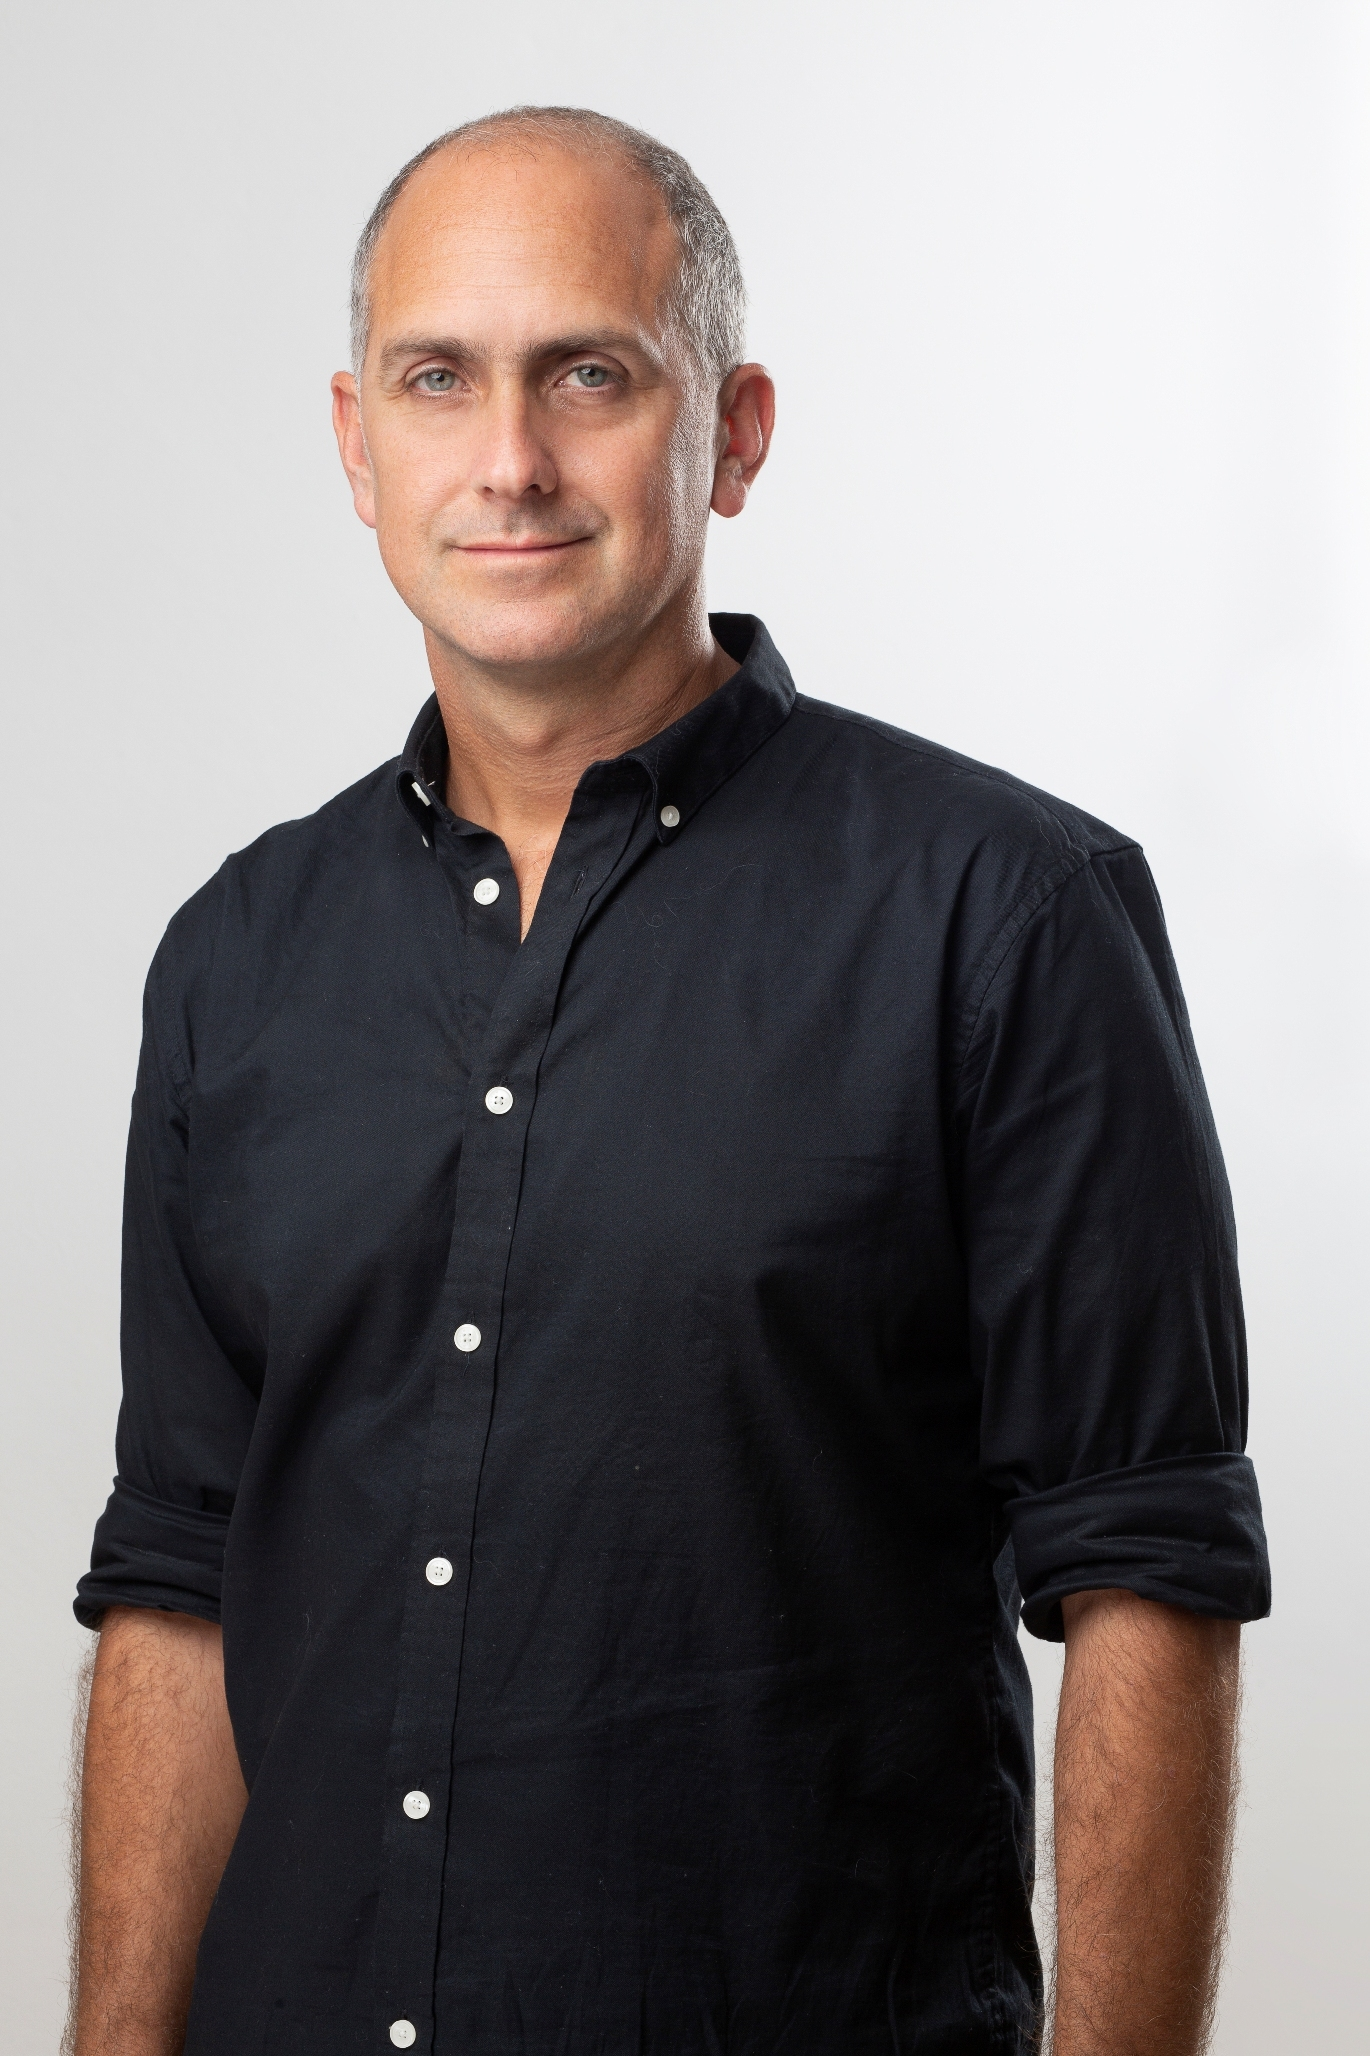 Gal Bar Dea, CEO of the First Digital Bank